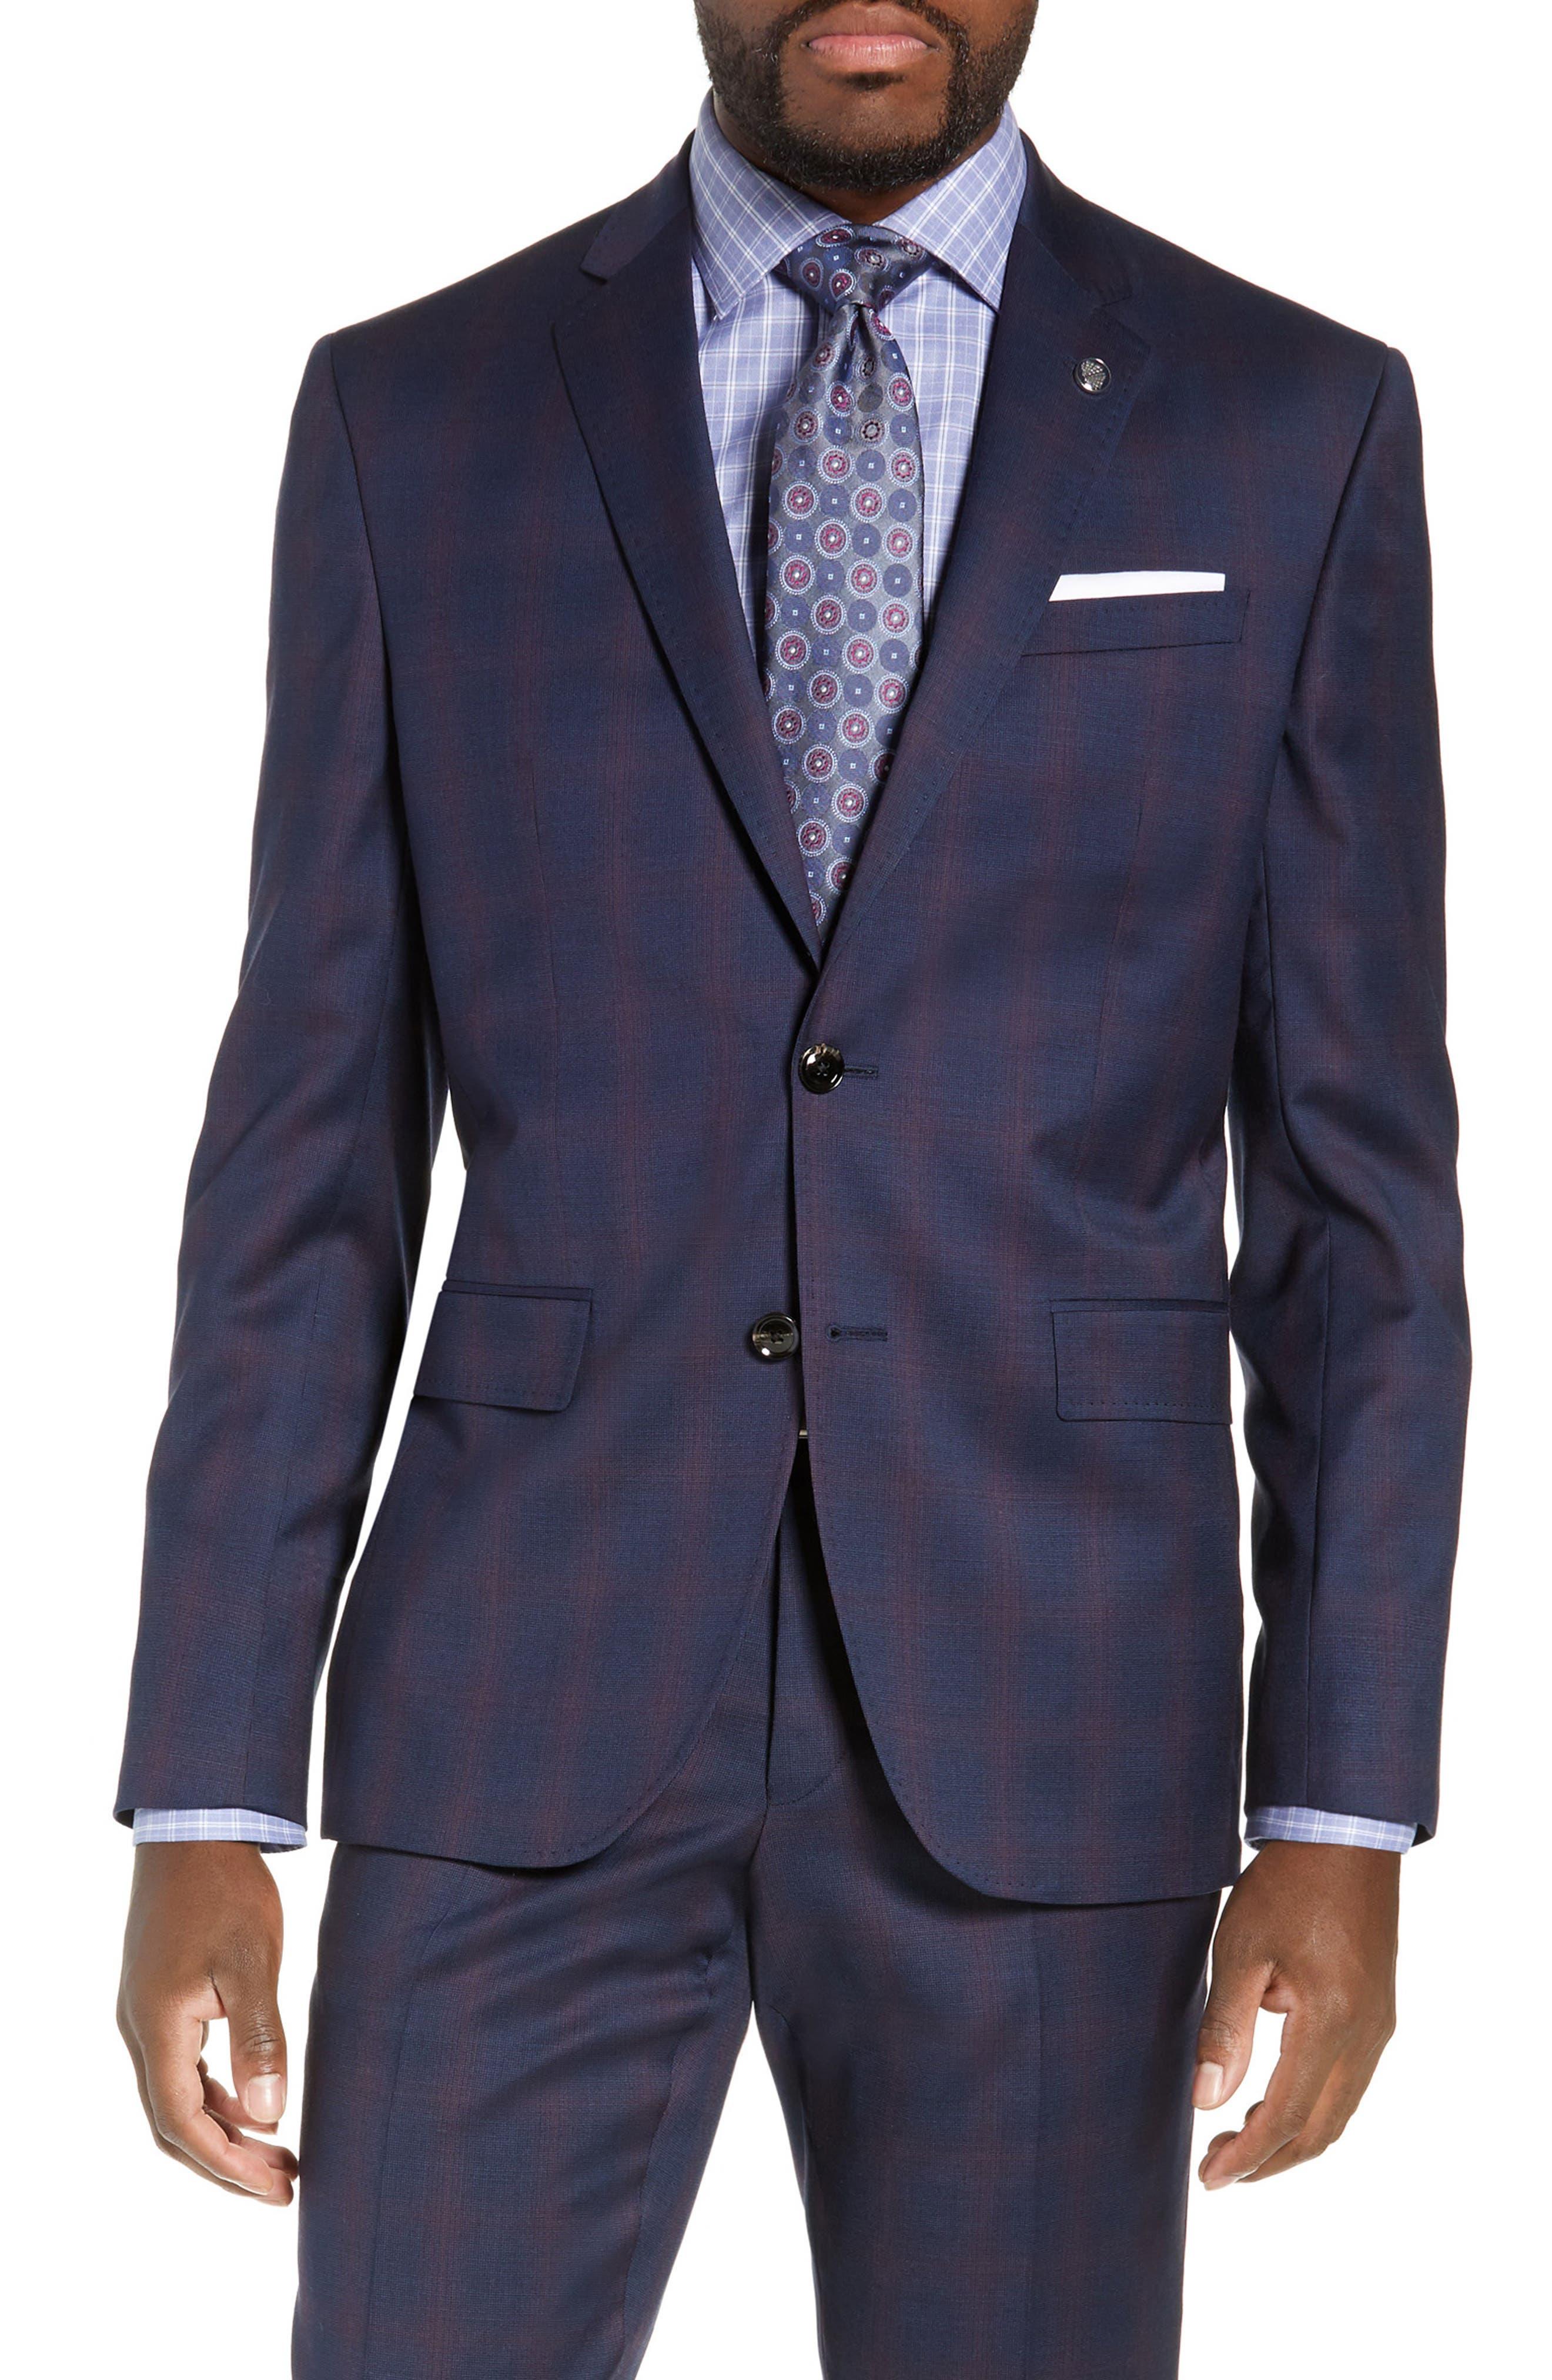 TED BAKER LONDON,                             Roger Slim Fit Plaid Wool Suit,                             Alternate thumbnail 5, color,                             NAVY